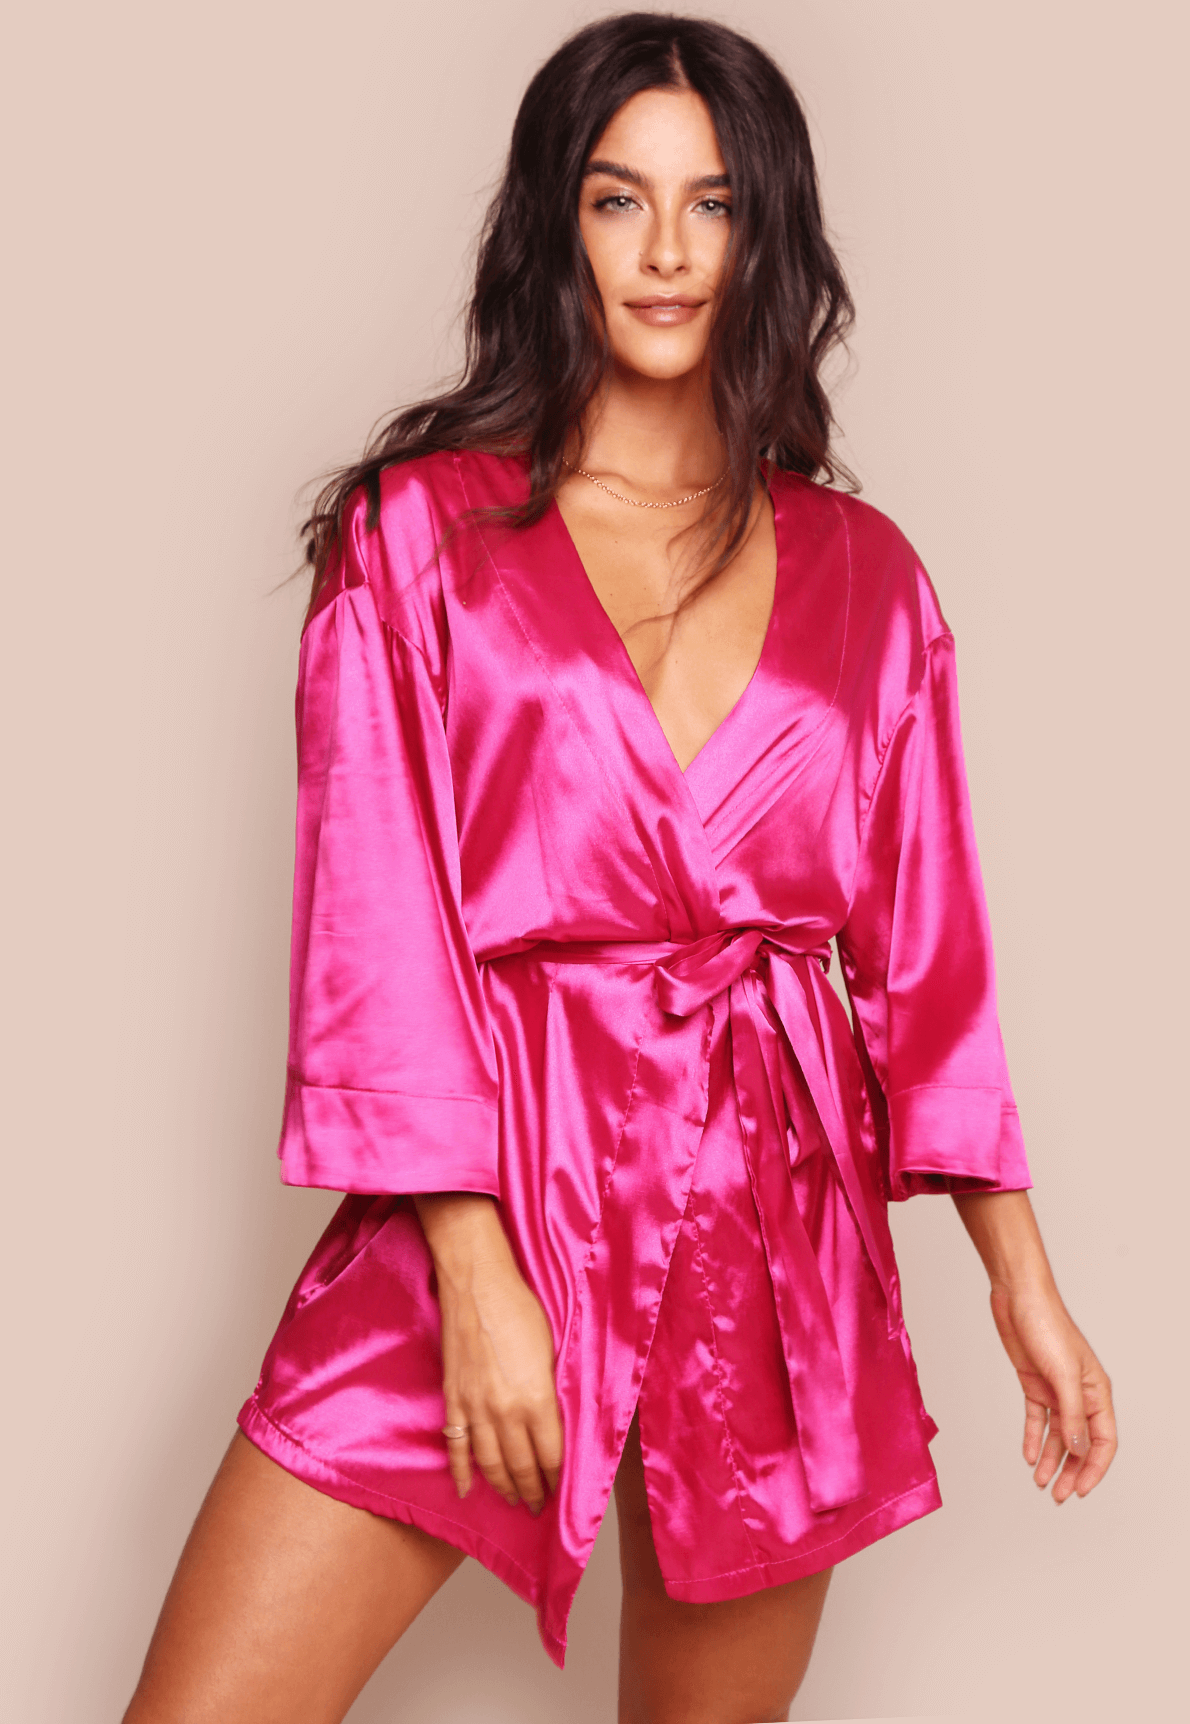 32178-robe-de-cetim-loli-girl--mundo-lolita-01